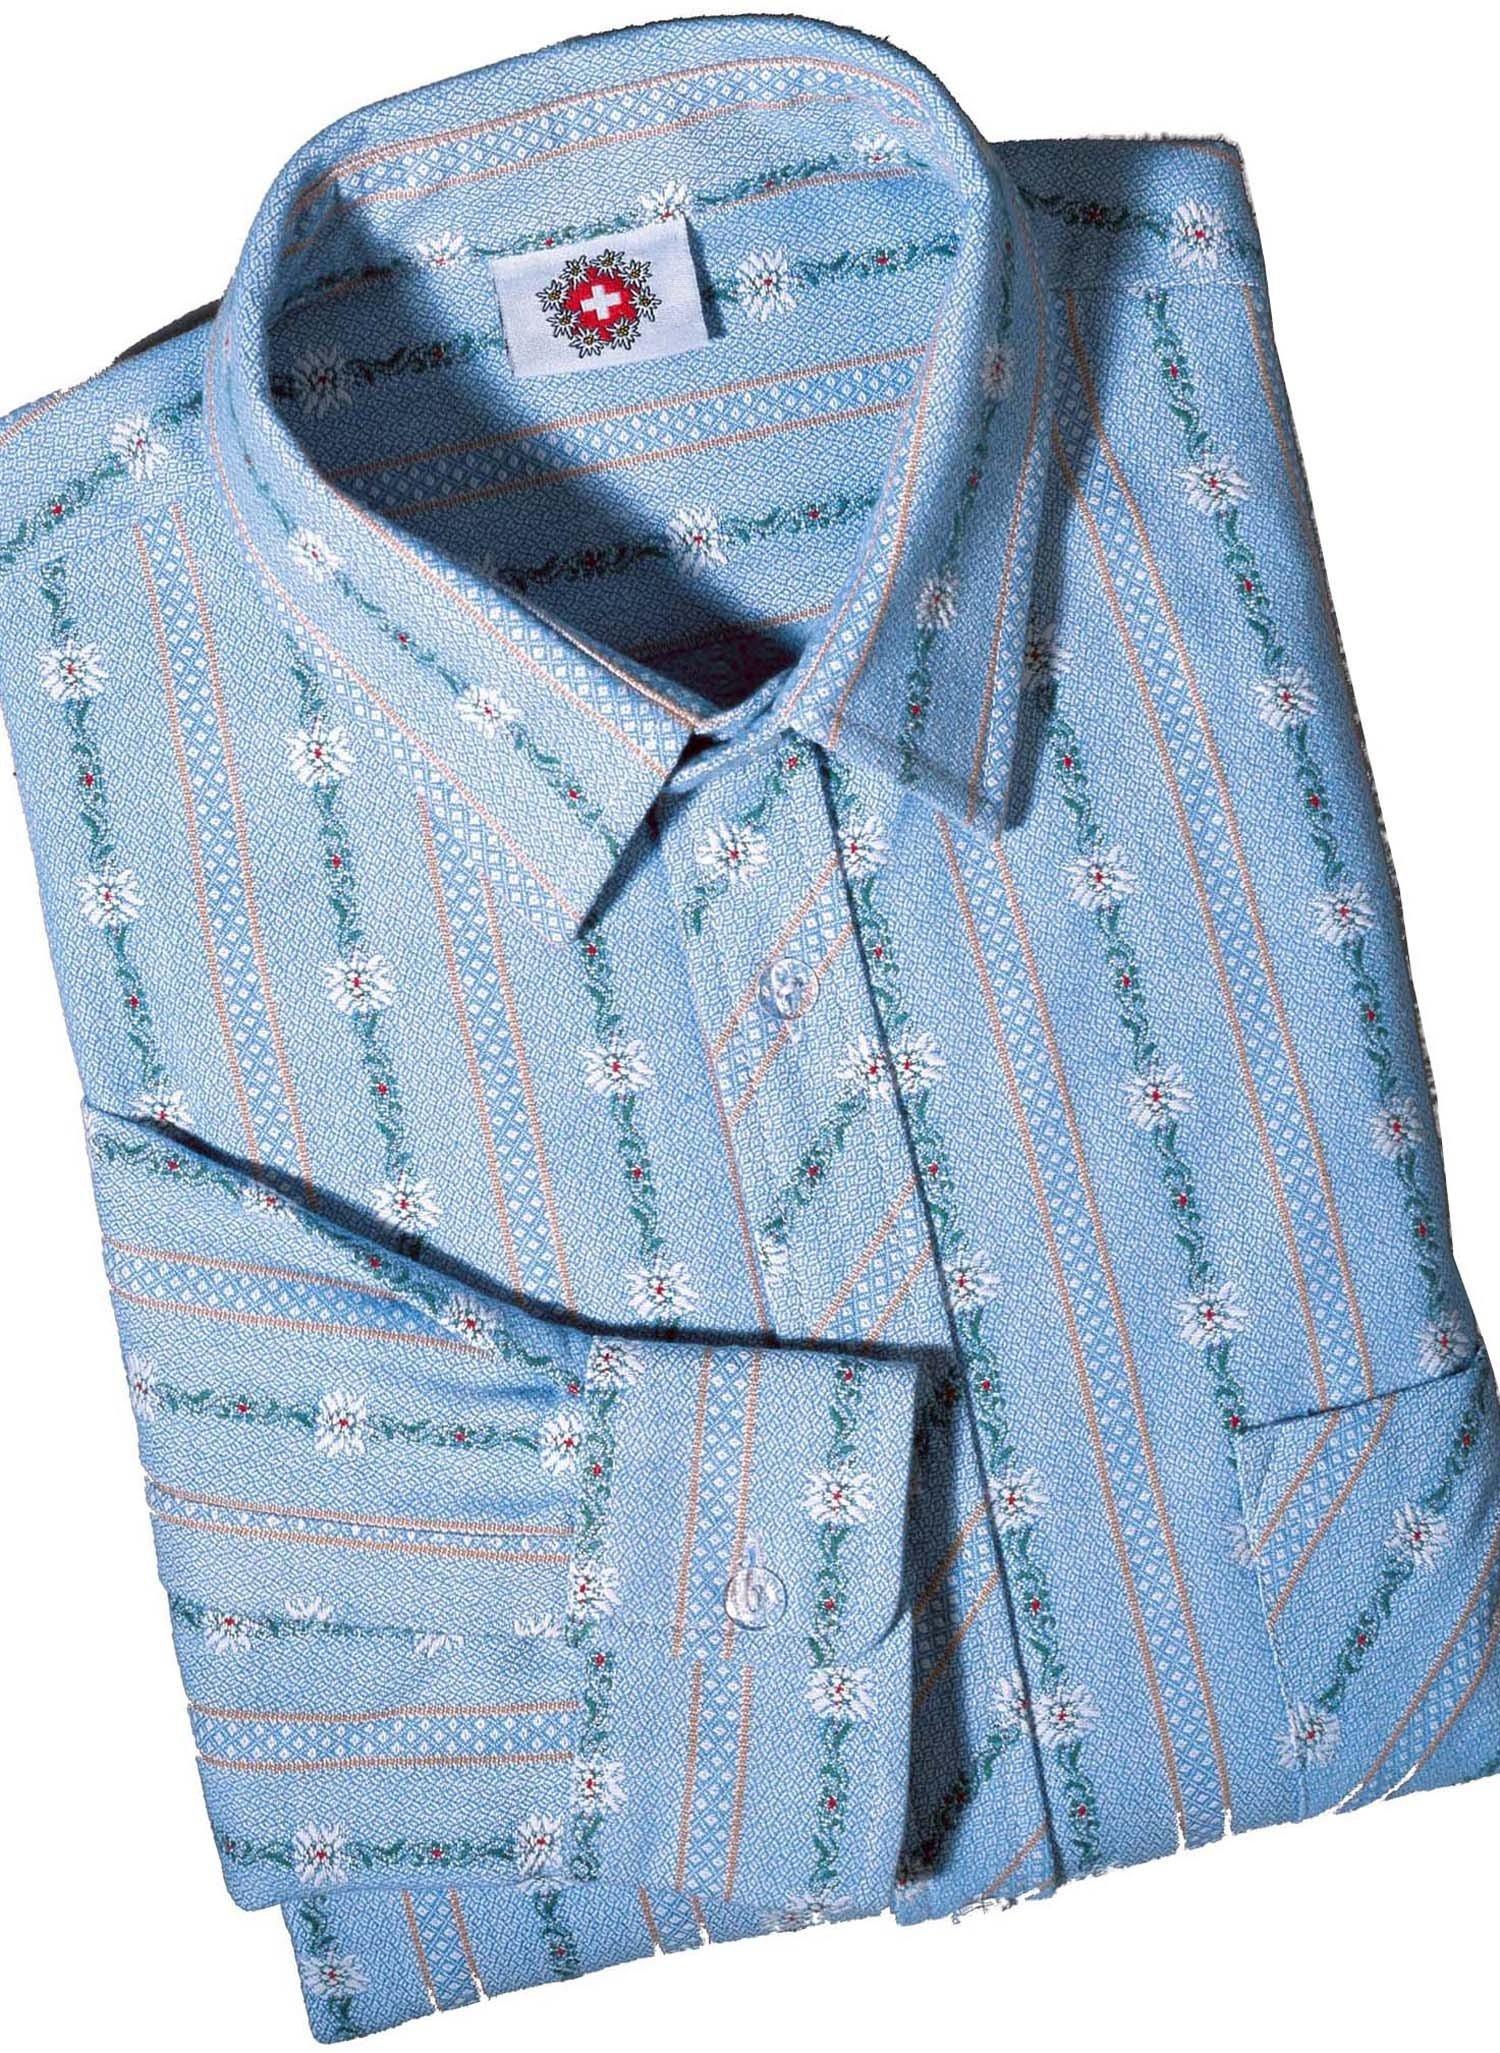 H-LA-Edelweiss Hemd, h.blau 3738 162